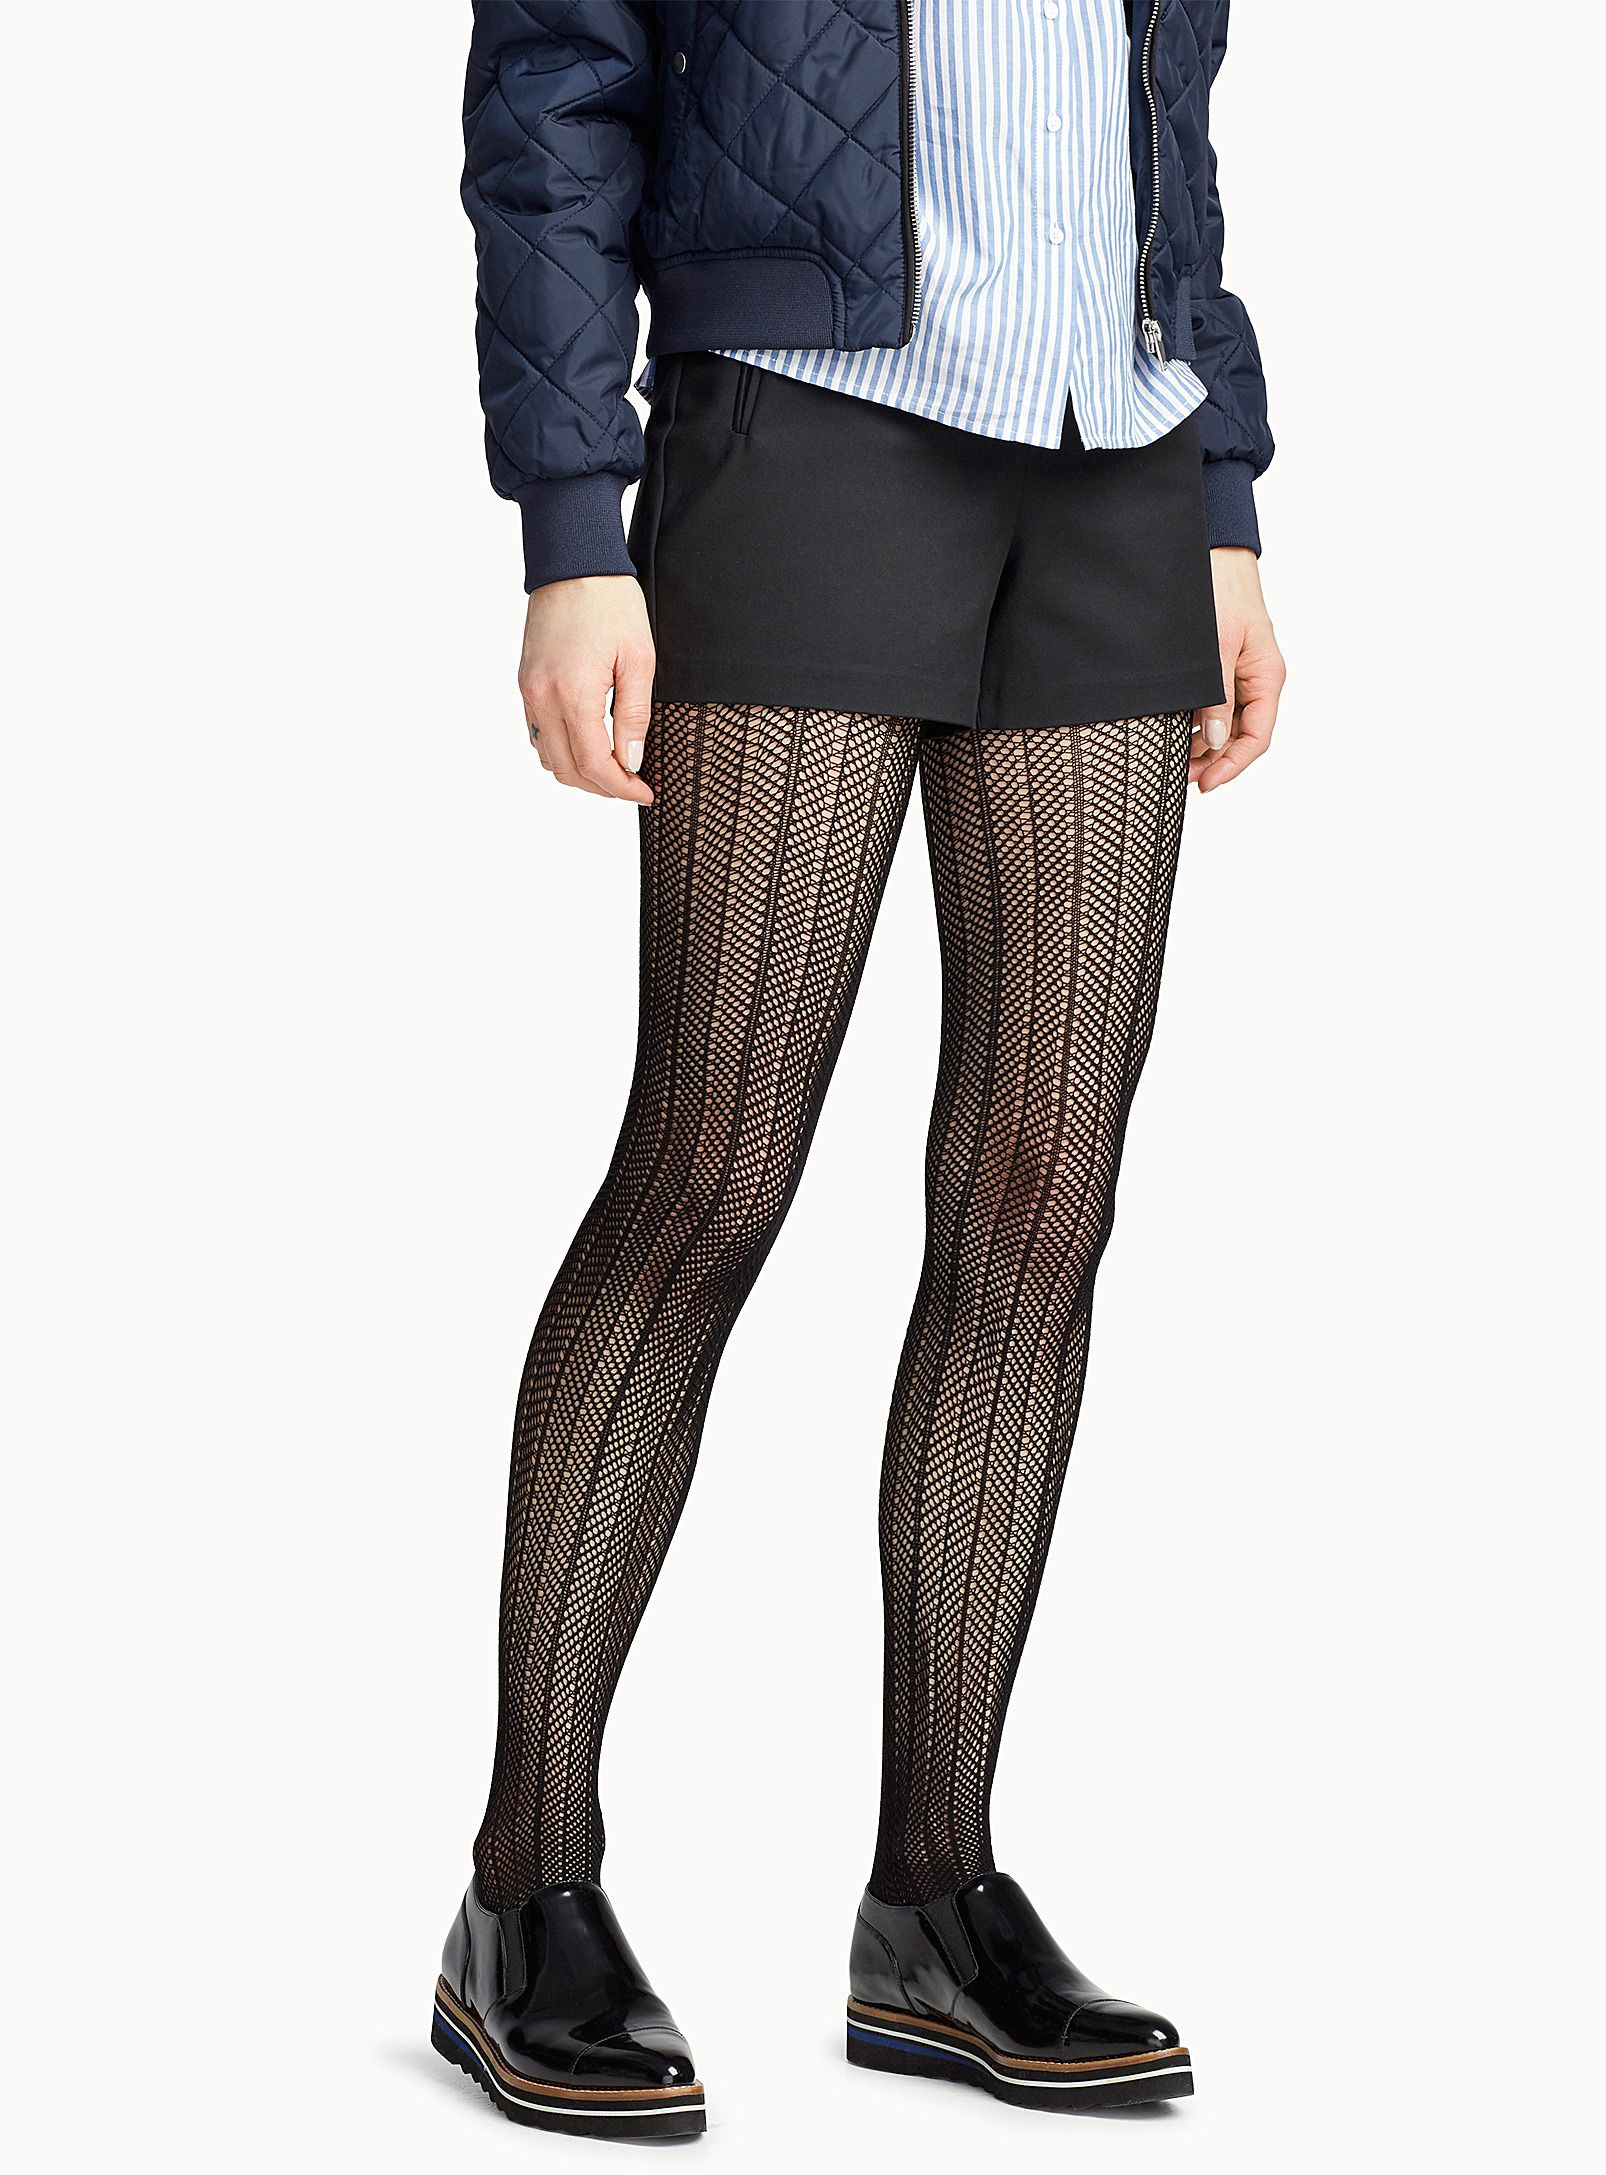 Mantyhose Çorap Tights by Swedish Stockings | Shorts